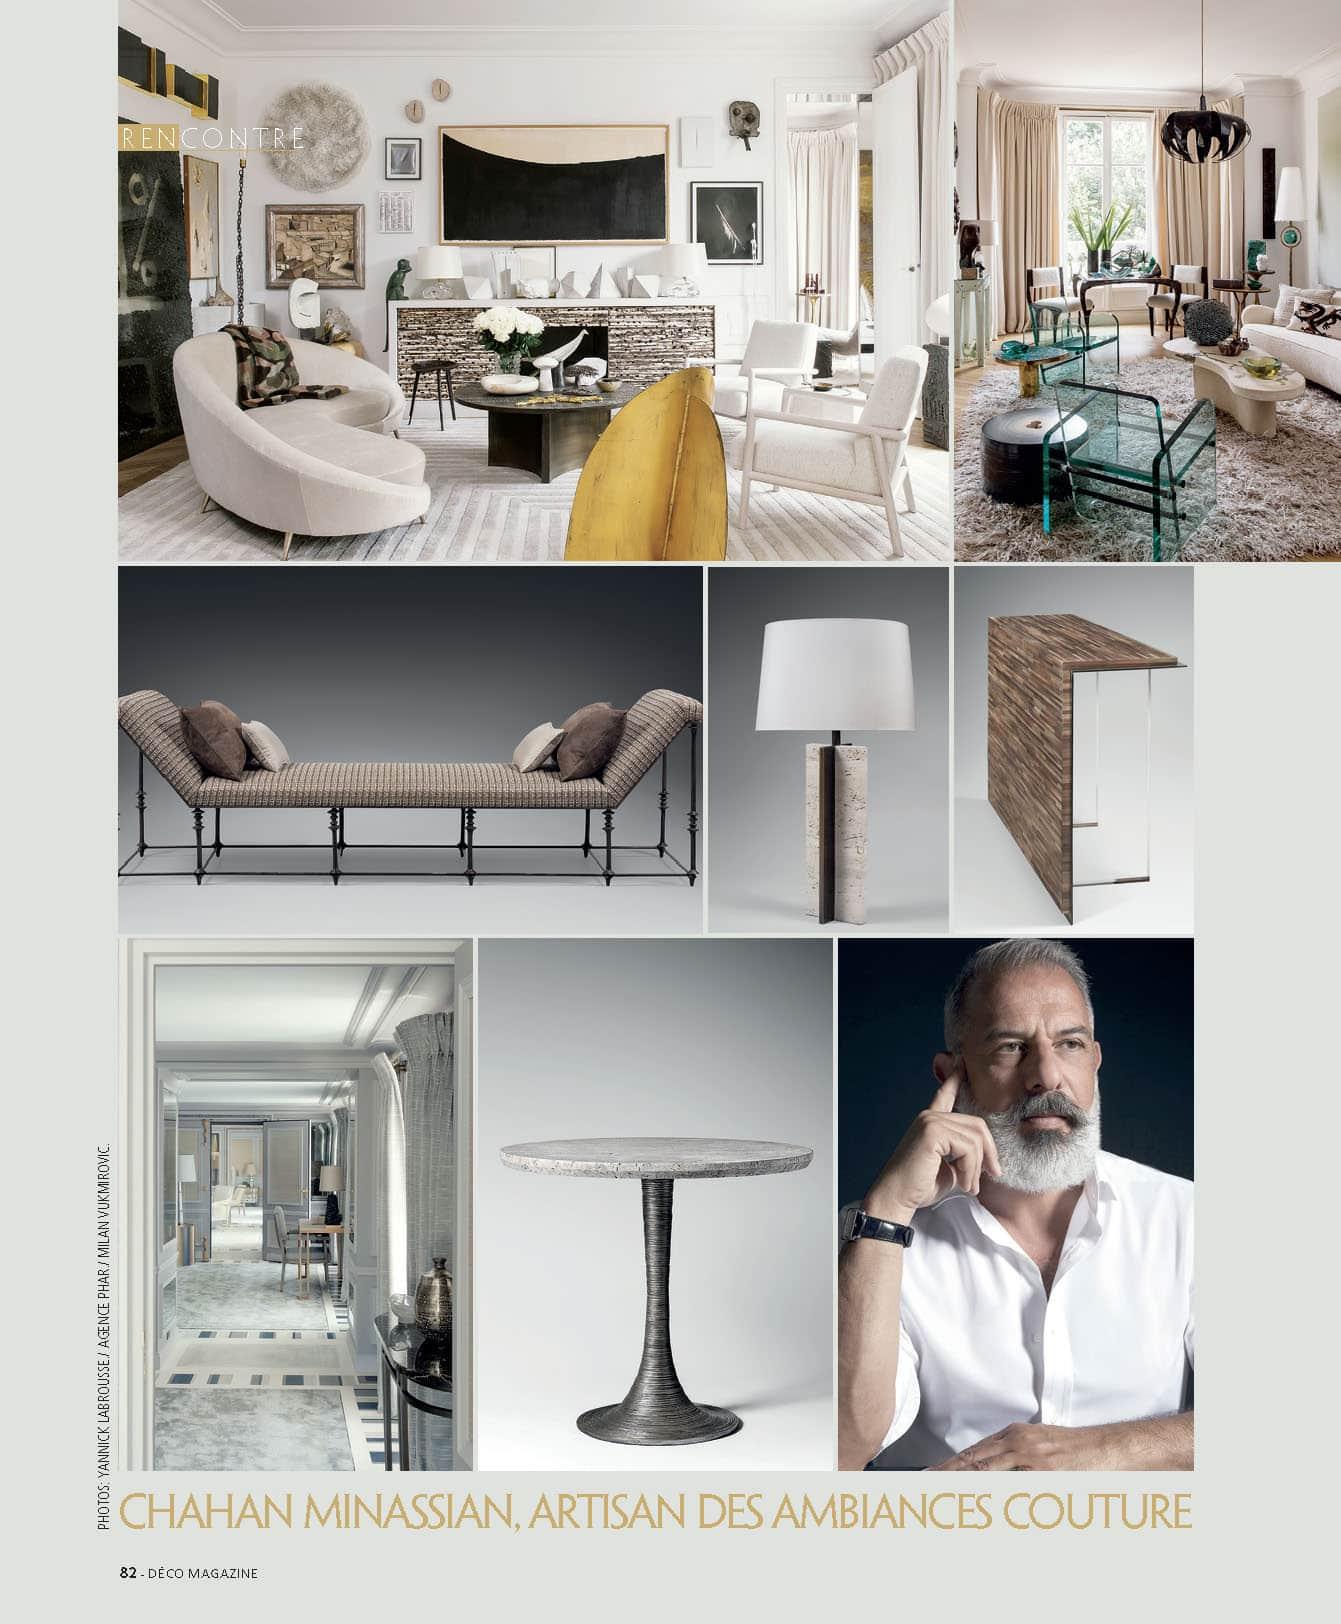 chahan-gallery-deco-magazine-18-1-1